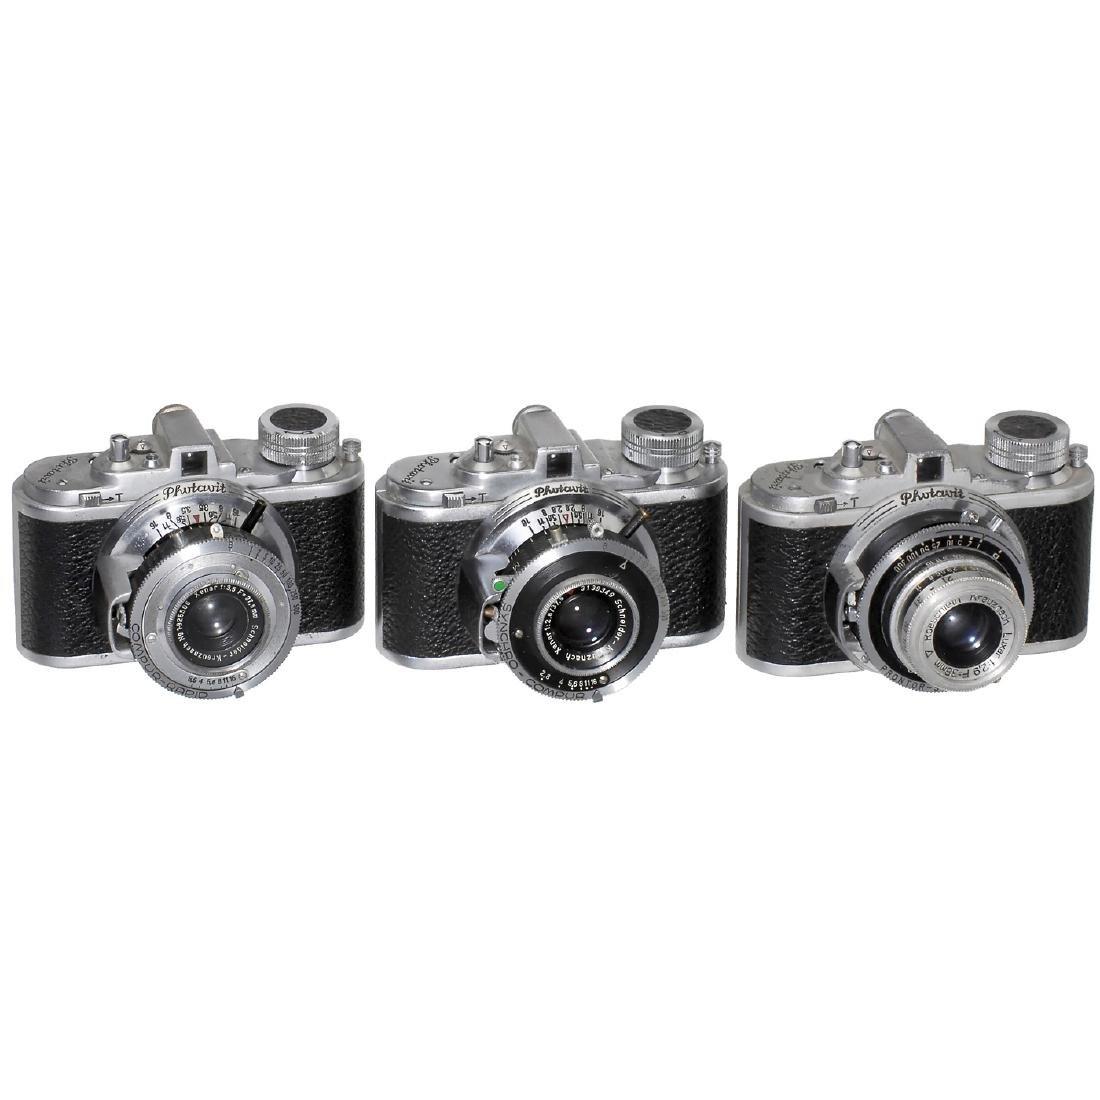 3 Photavit 24 x 24 mm Cameras